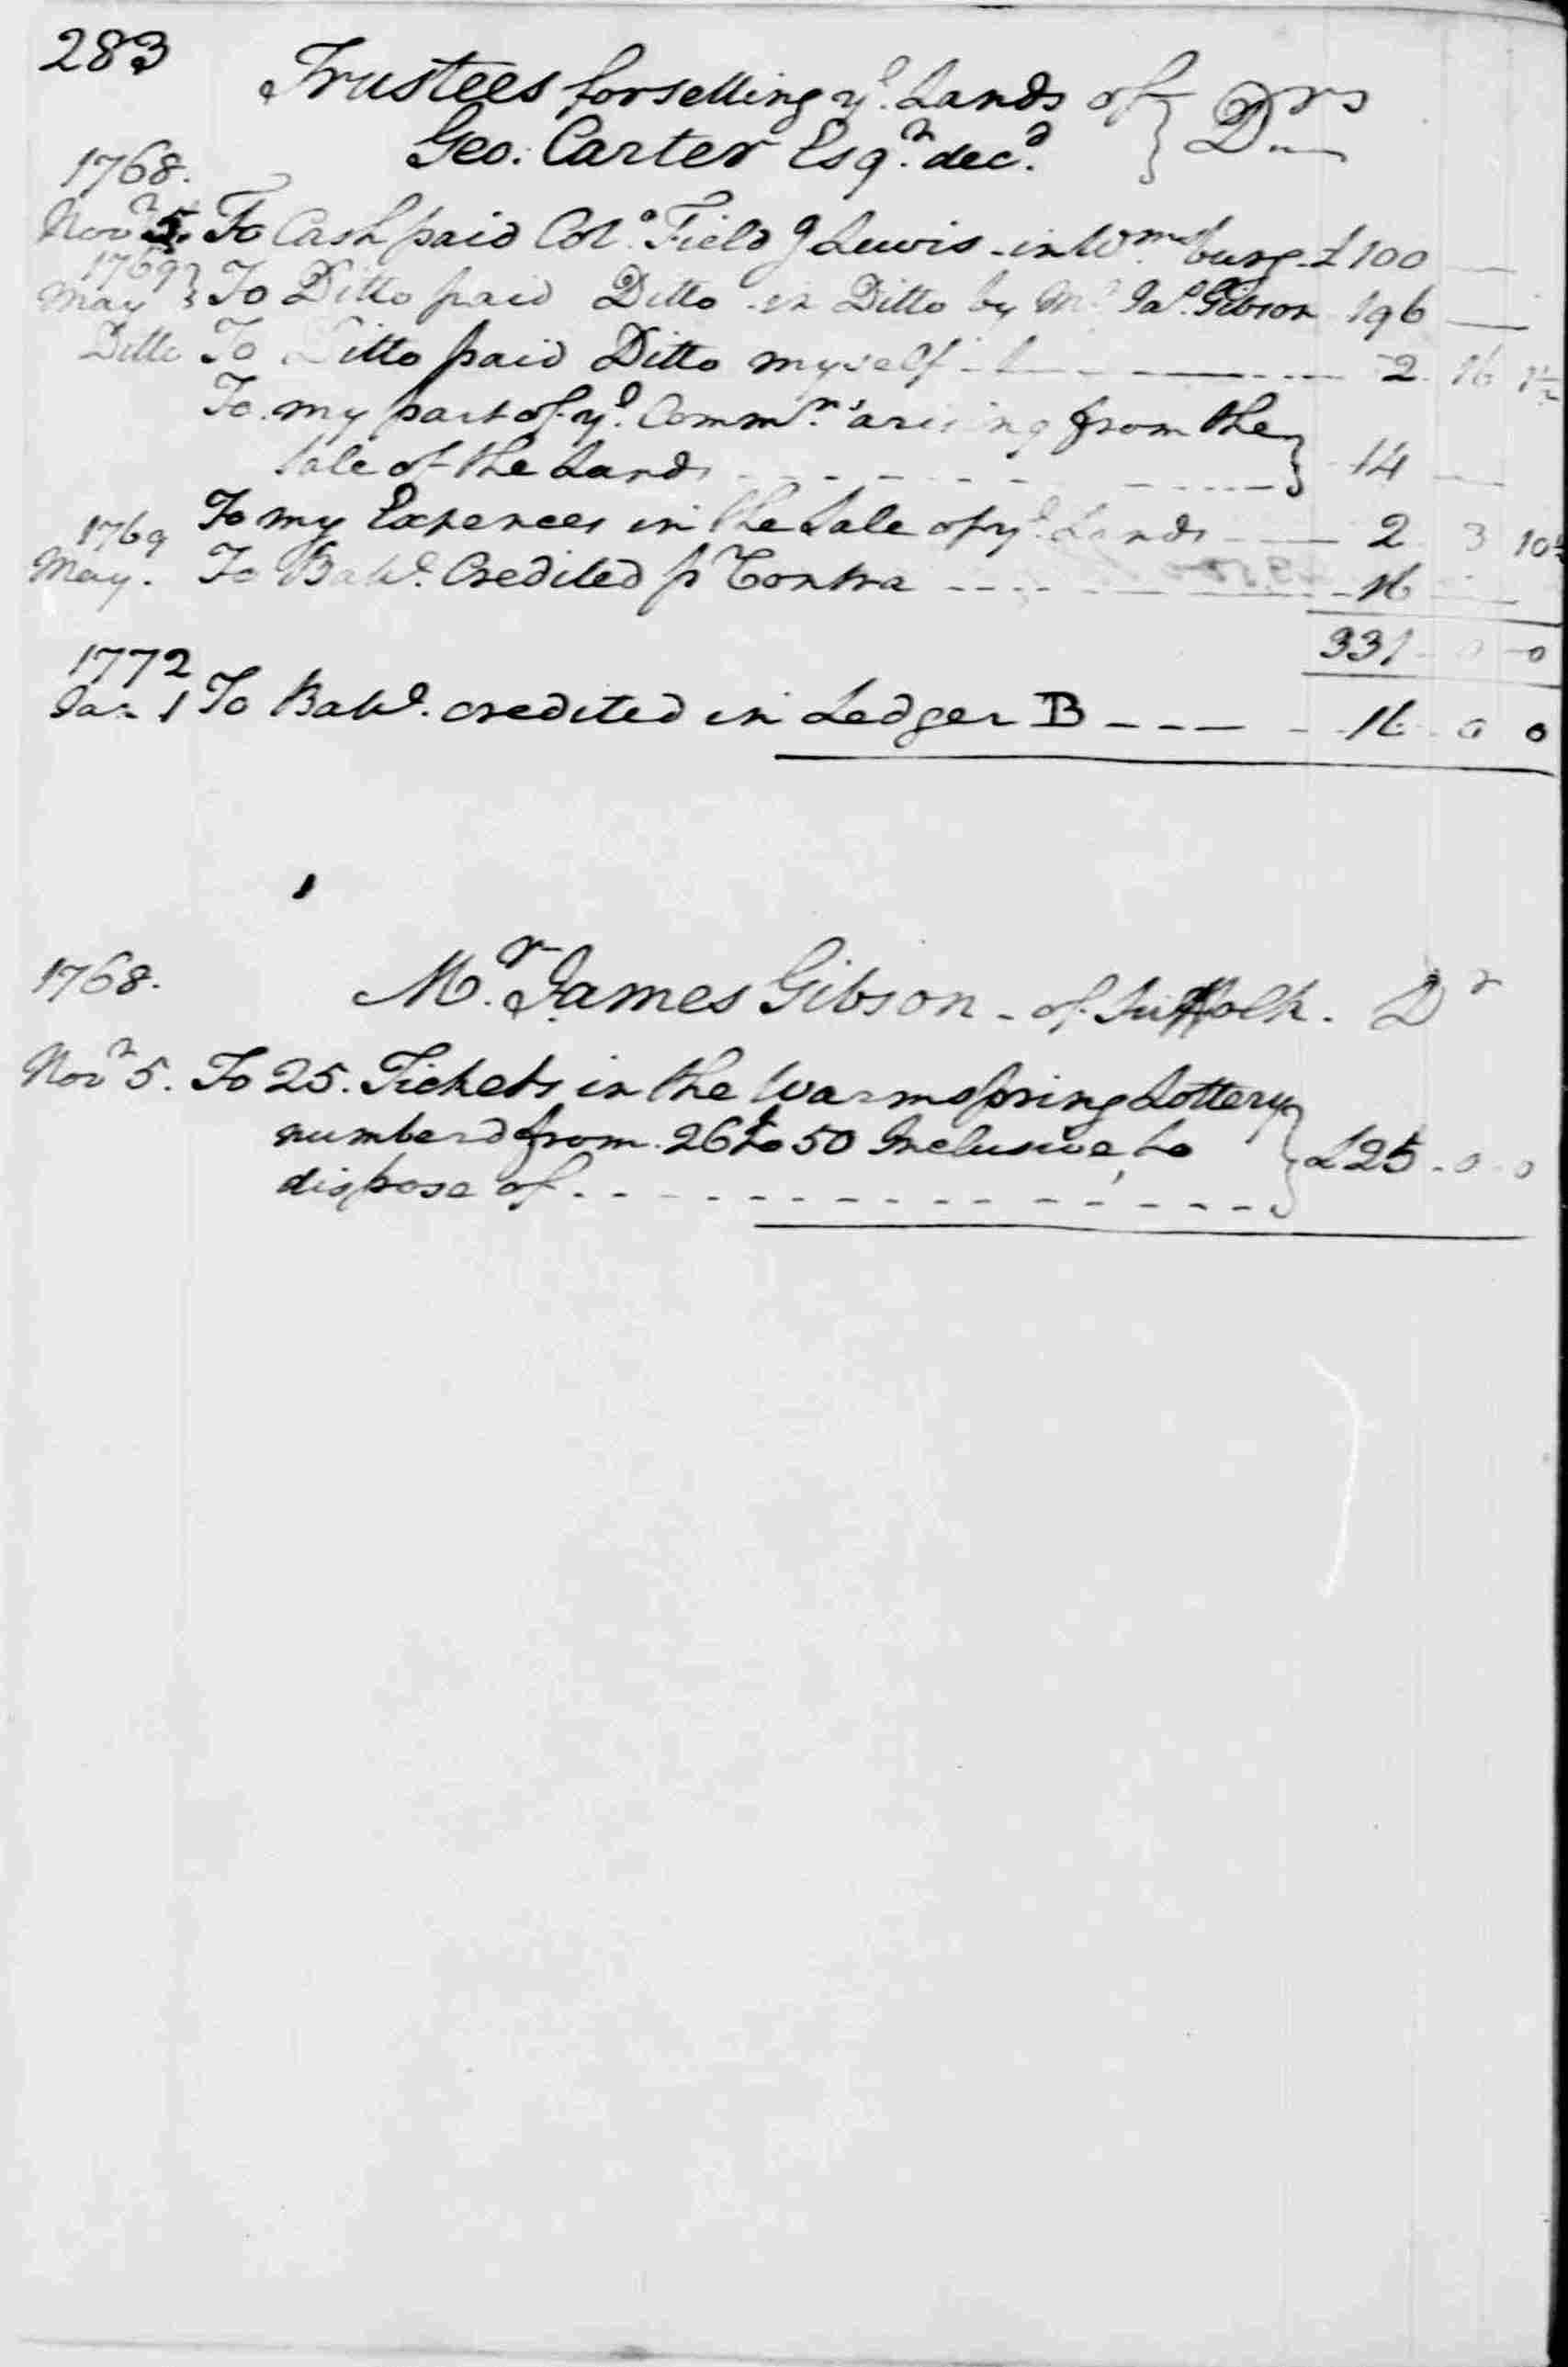 Ledger A, folio 238, left side